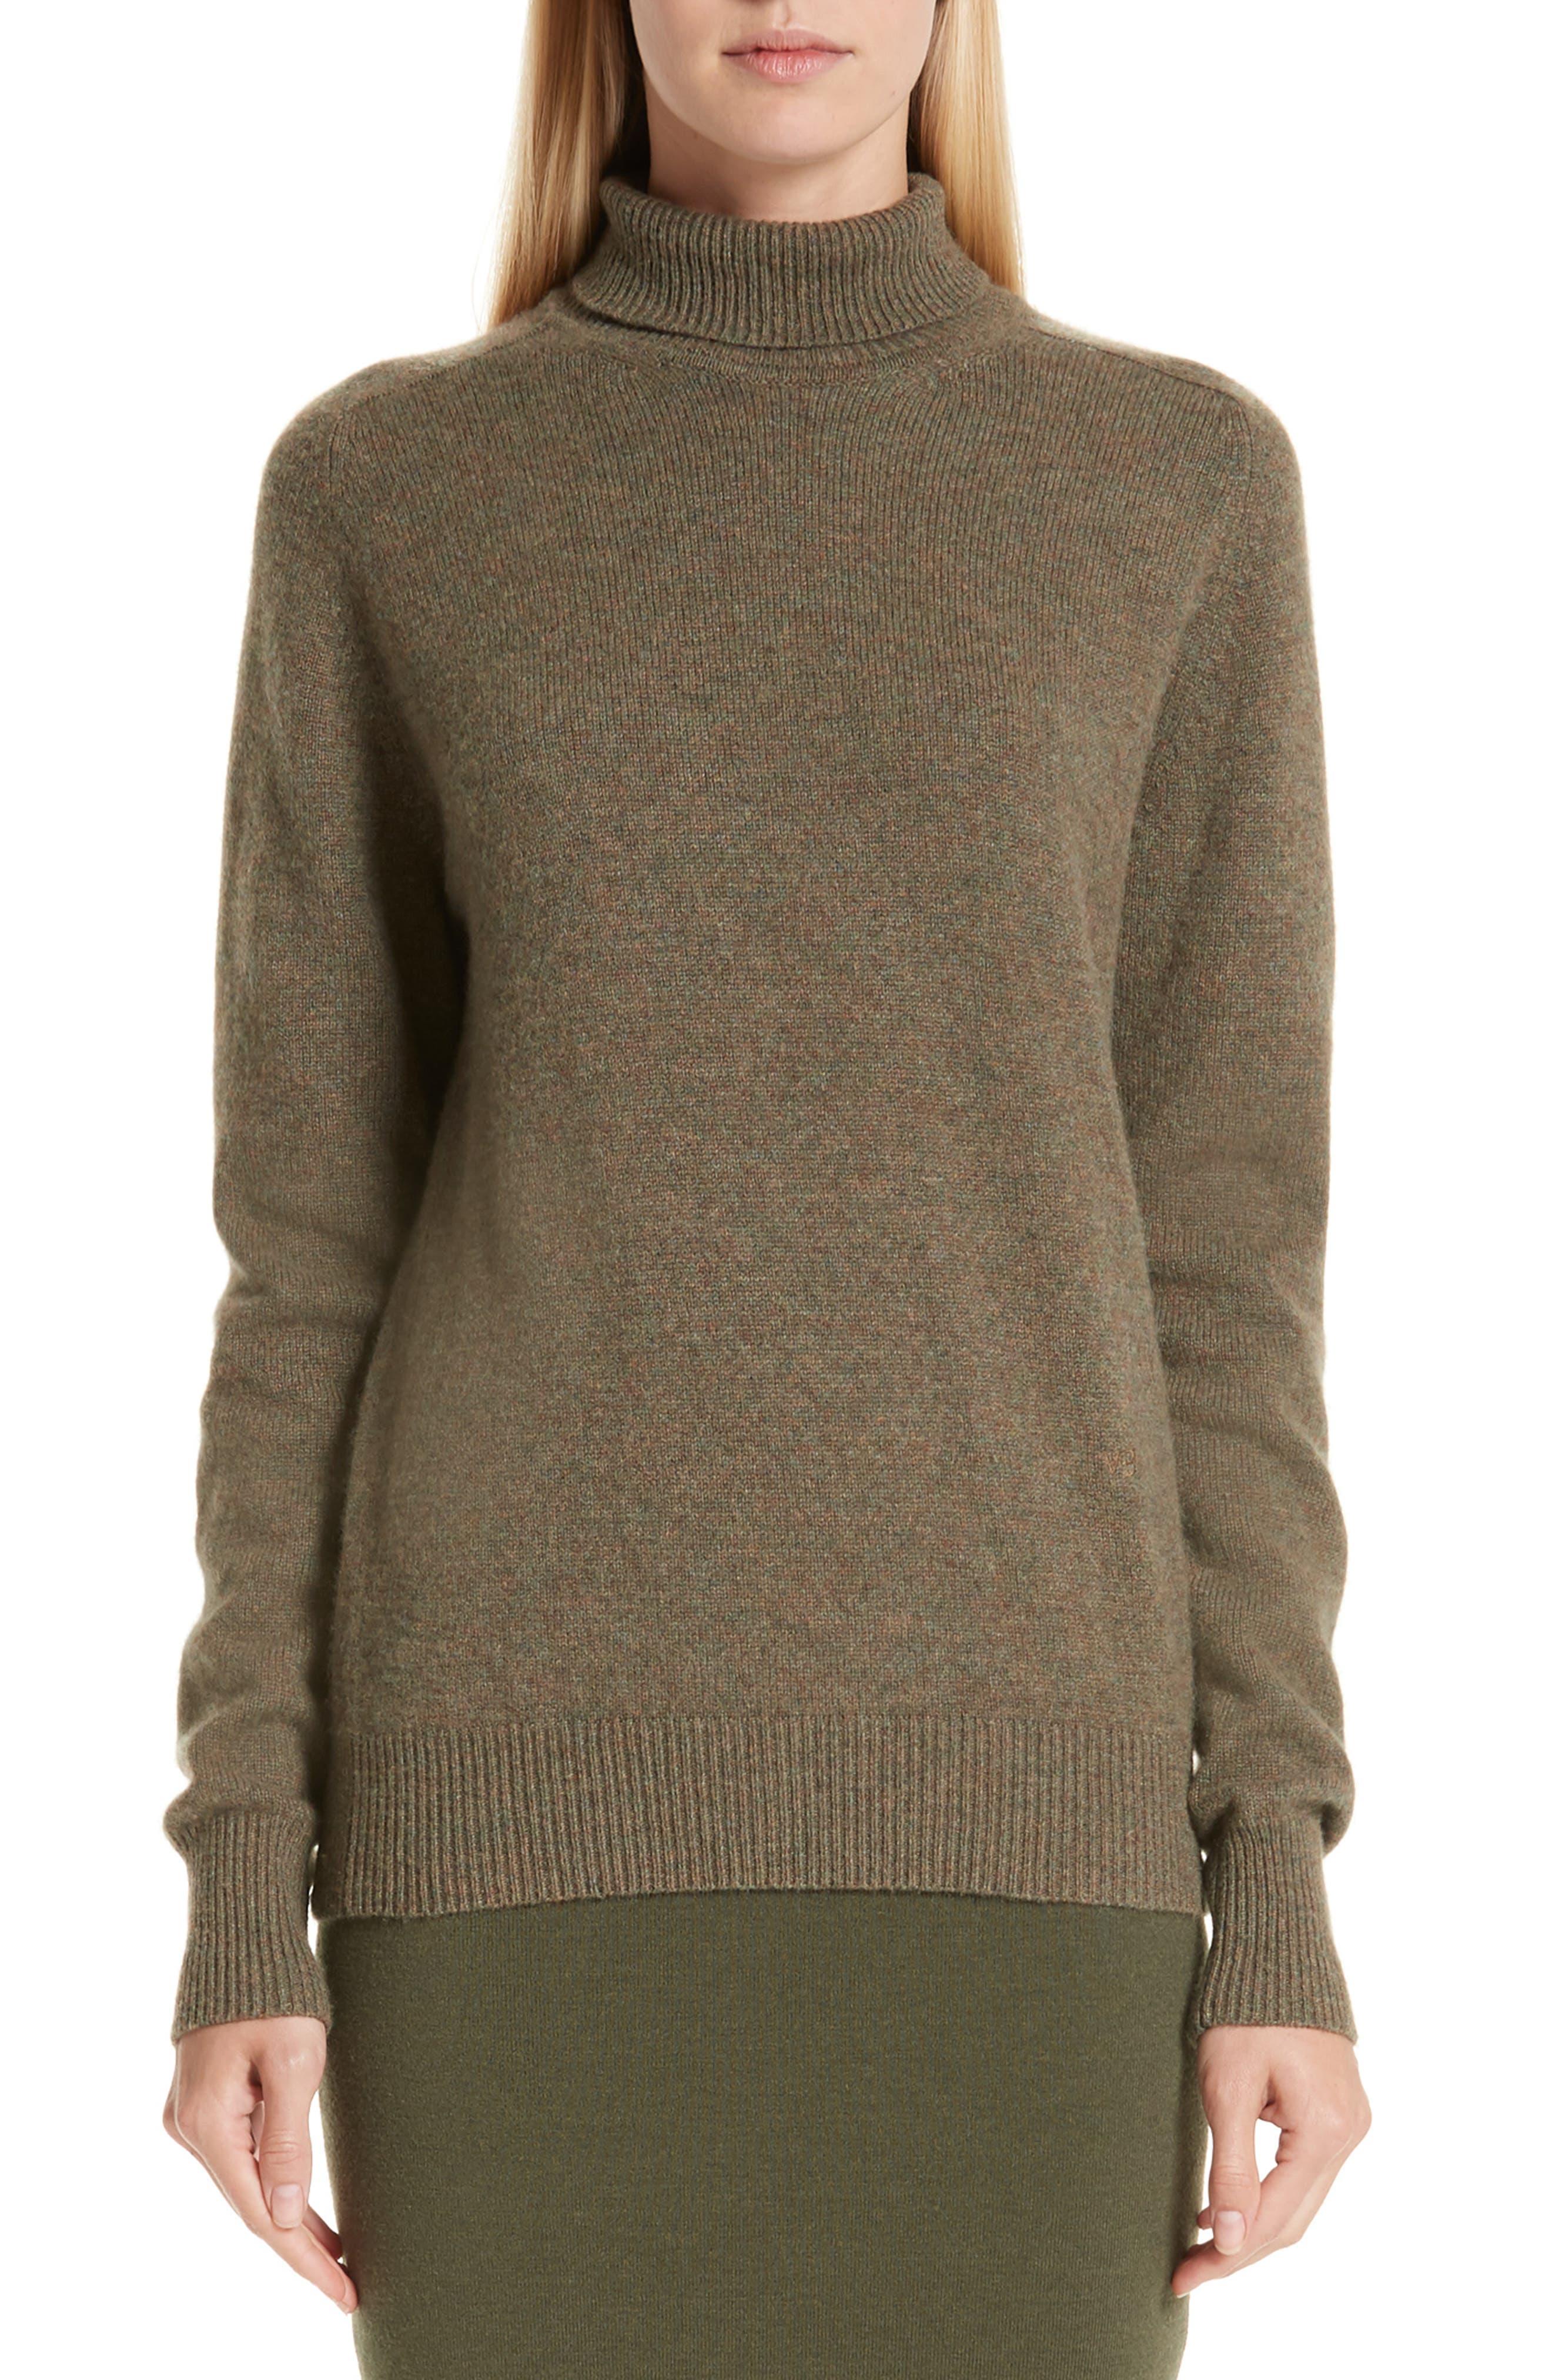 VICTORIA BECKHAM Stretch Cashmere Turtleneck Sweater, Main, color, OLIVE